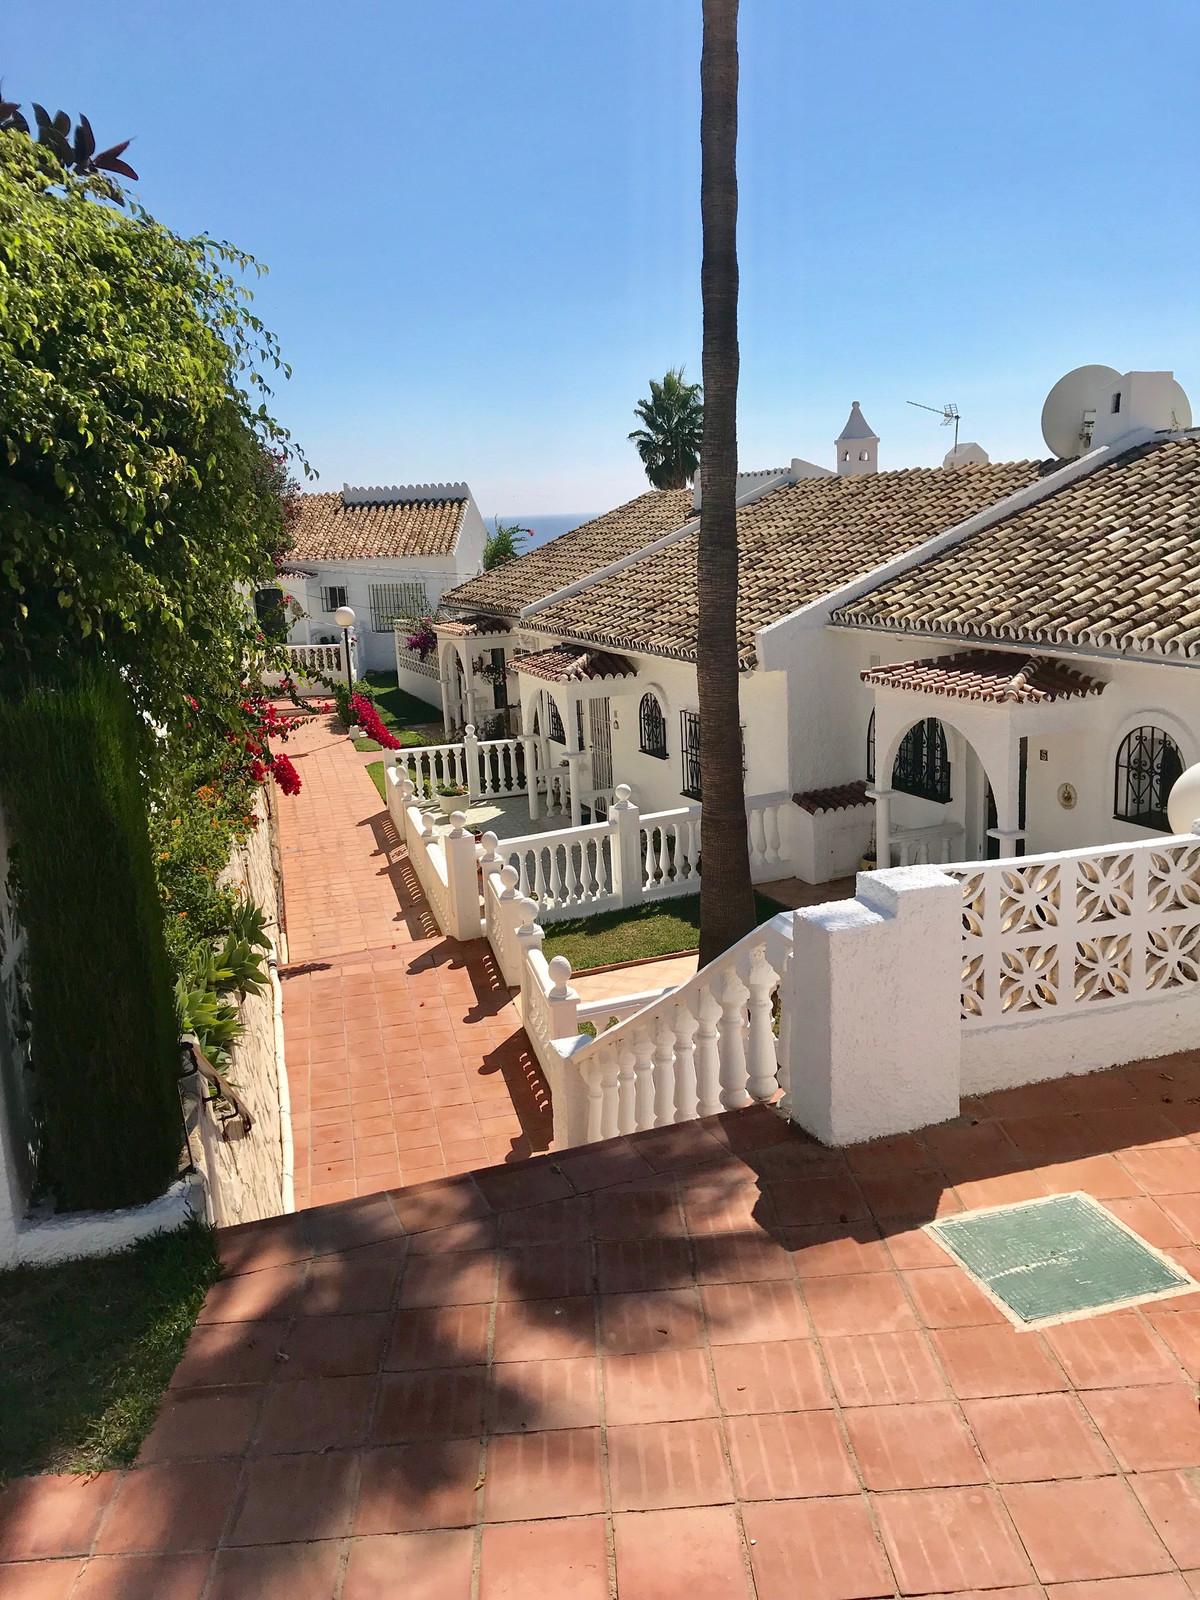 2 Bedroom Townhouse for sale El Faro